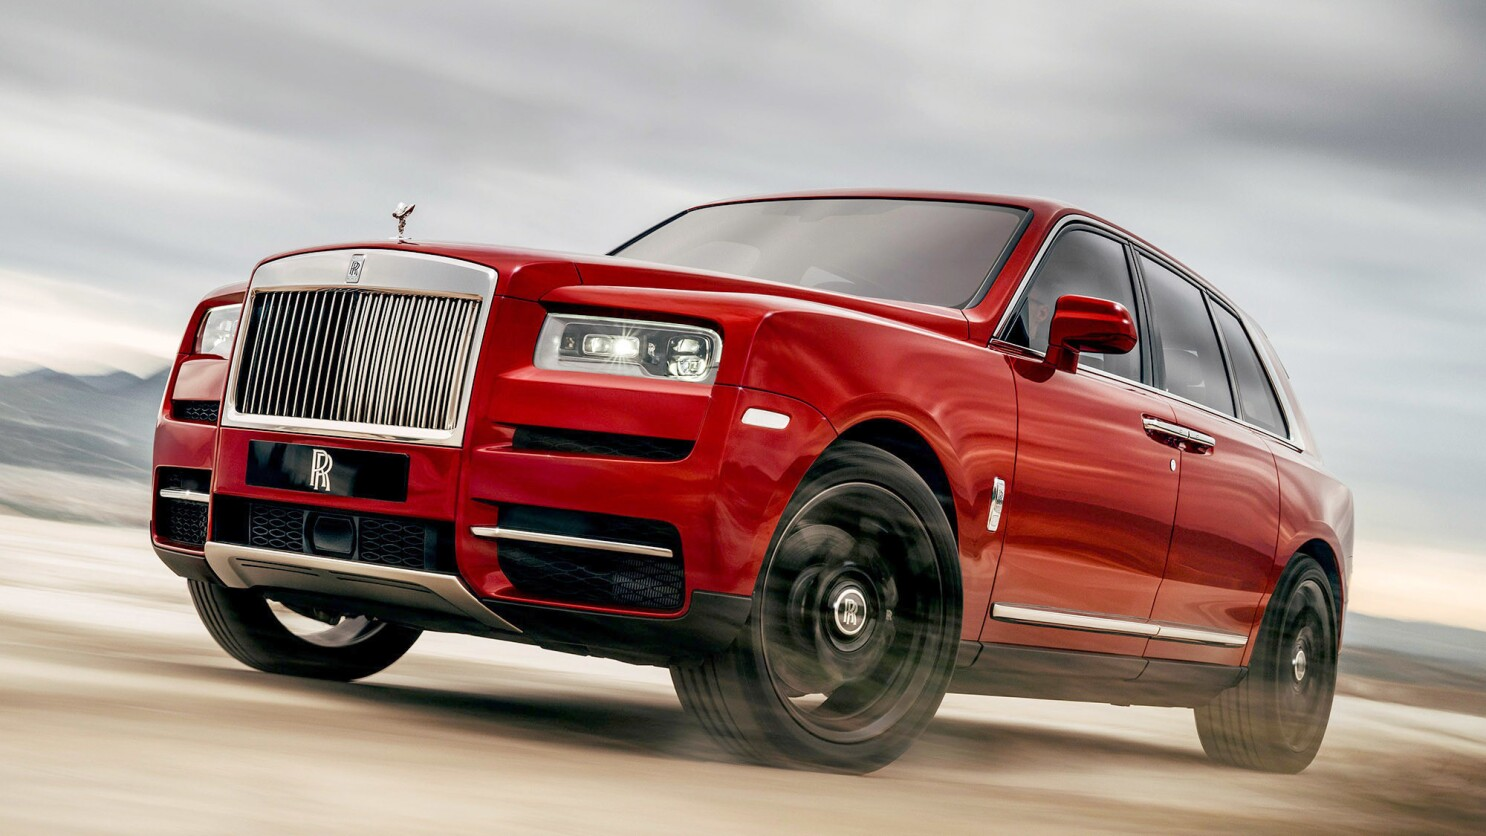 2019 Rolls Royce Cullinan: Design, Powertrain, Release >> The Rolls Royce Cullinan Suv Is Wonderful But At 325 000